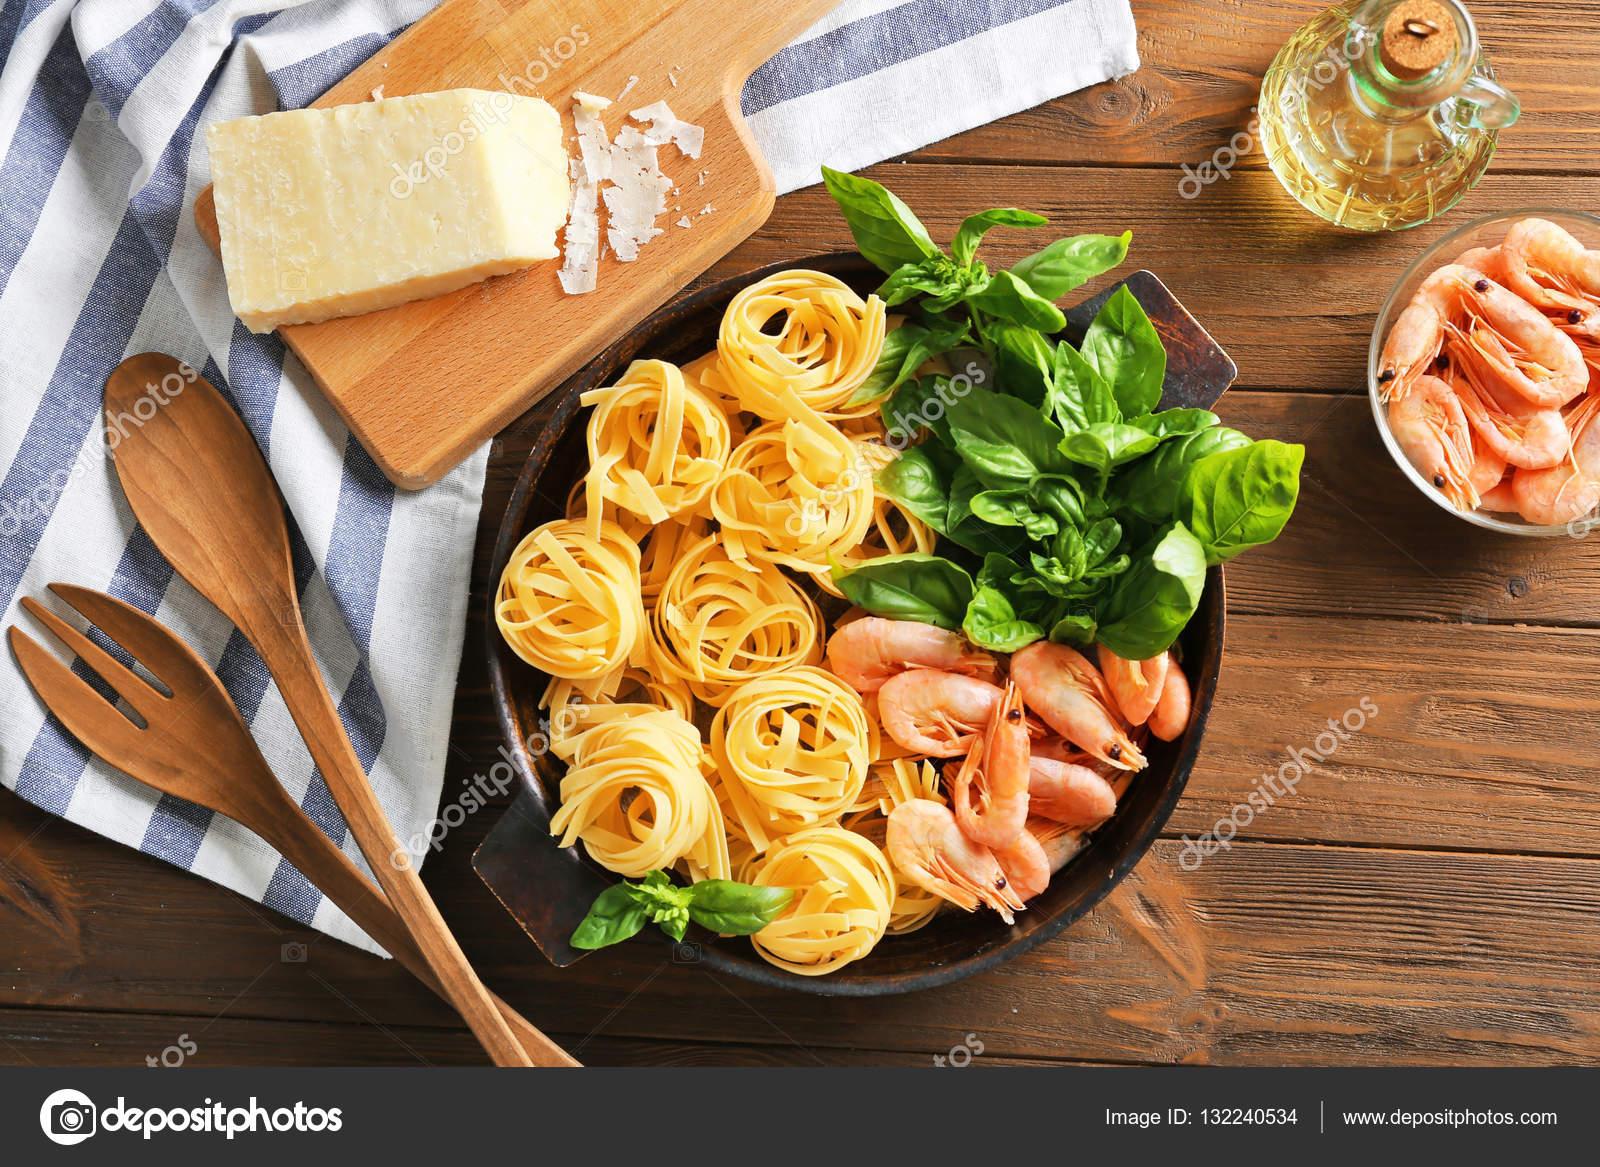 kitchen table high top best cabinets 潘用木制的桌子 顶视图上的美味面食 叉 匙 餐巾和厨房板的食材 照片作者belchonock